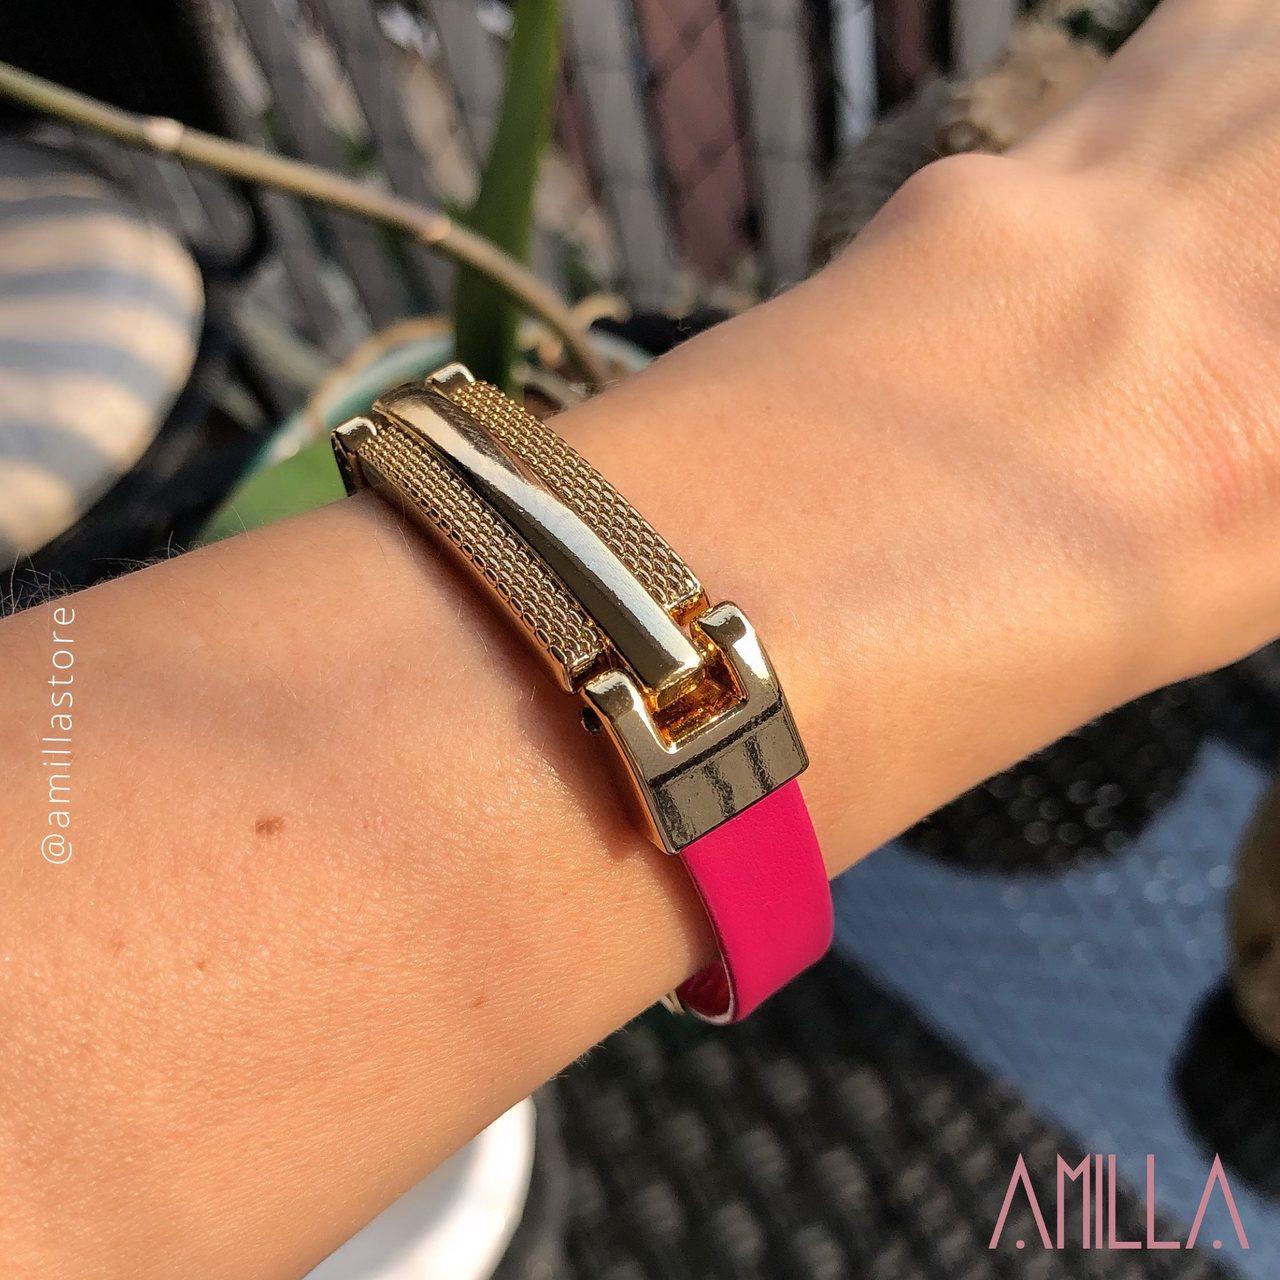 Pulseira Couro Rosa Detalhe Retangulo Metal Trabalhado Banho Ouro